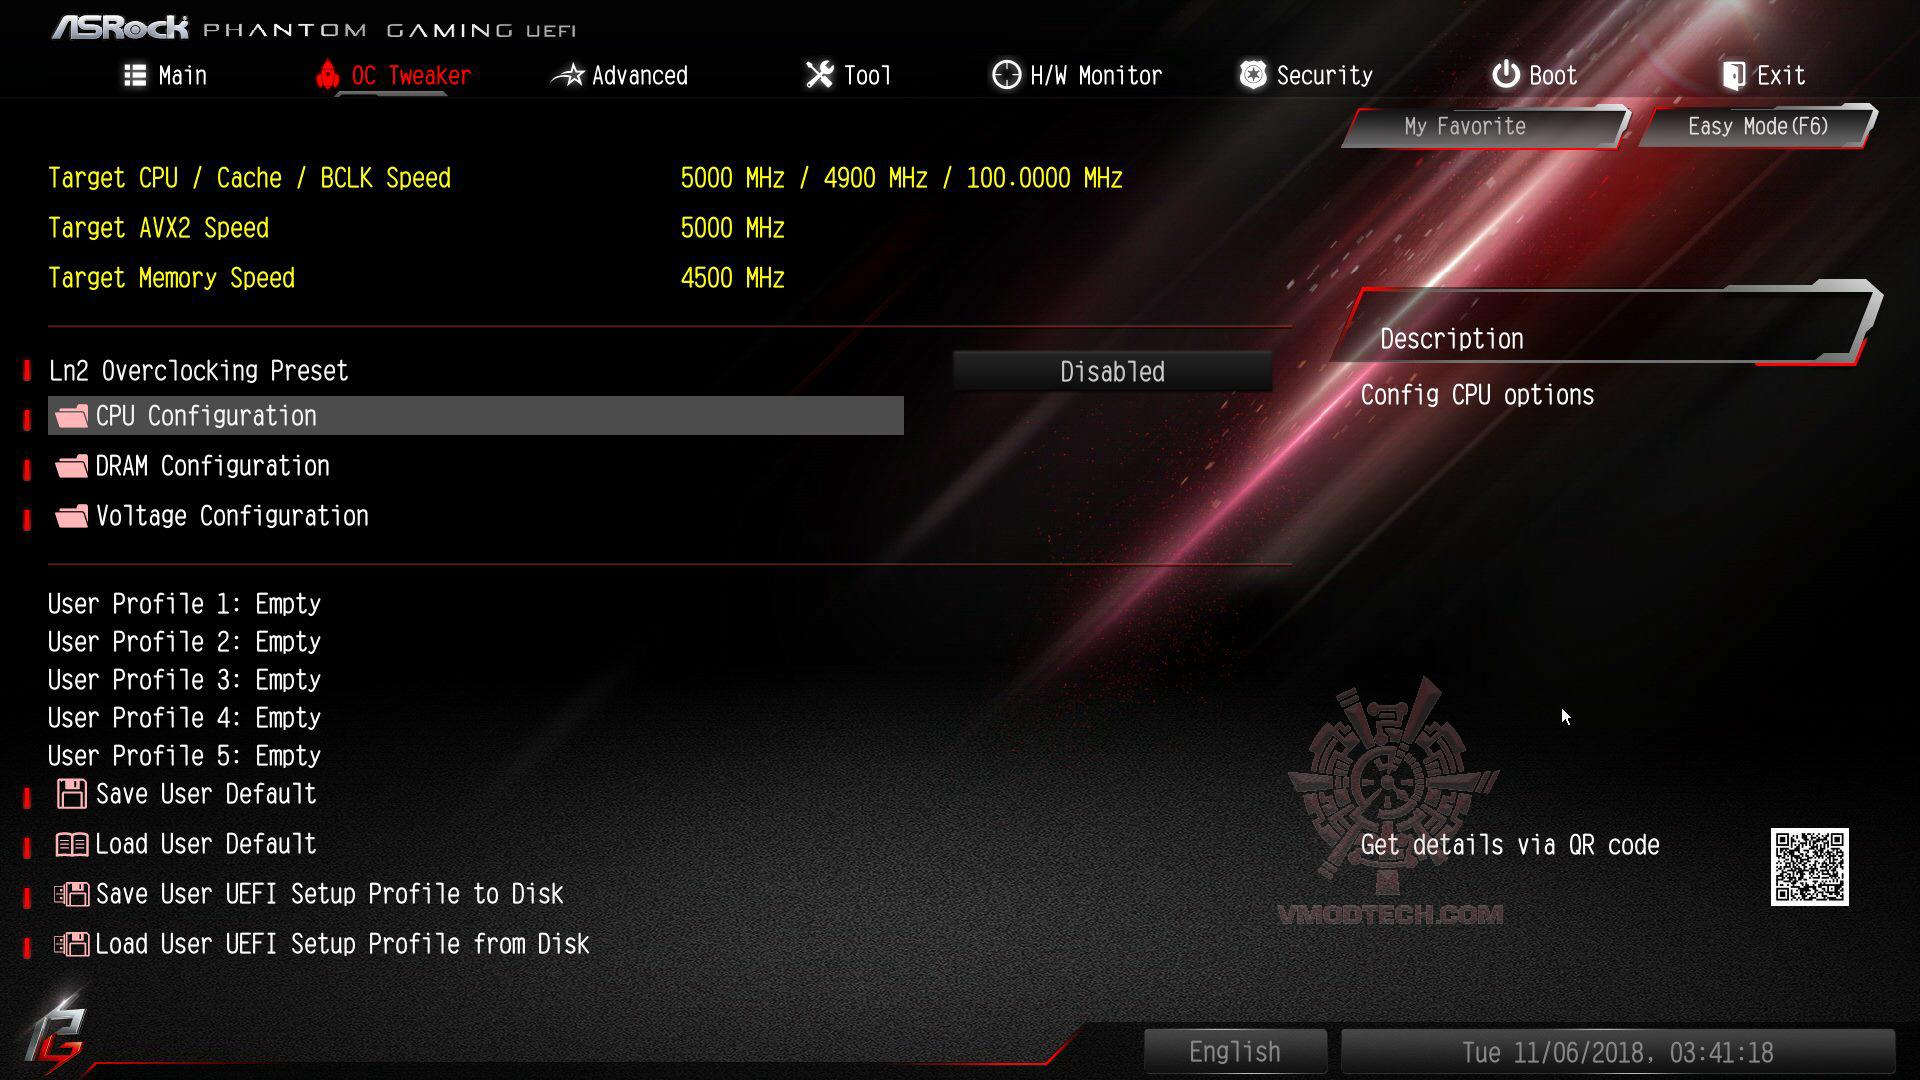 45663970 580313115732087 1884342250293428224 n ASRock Z390 Phantom Gaming ITX/ac Review